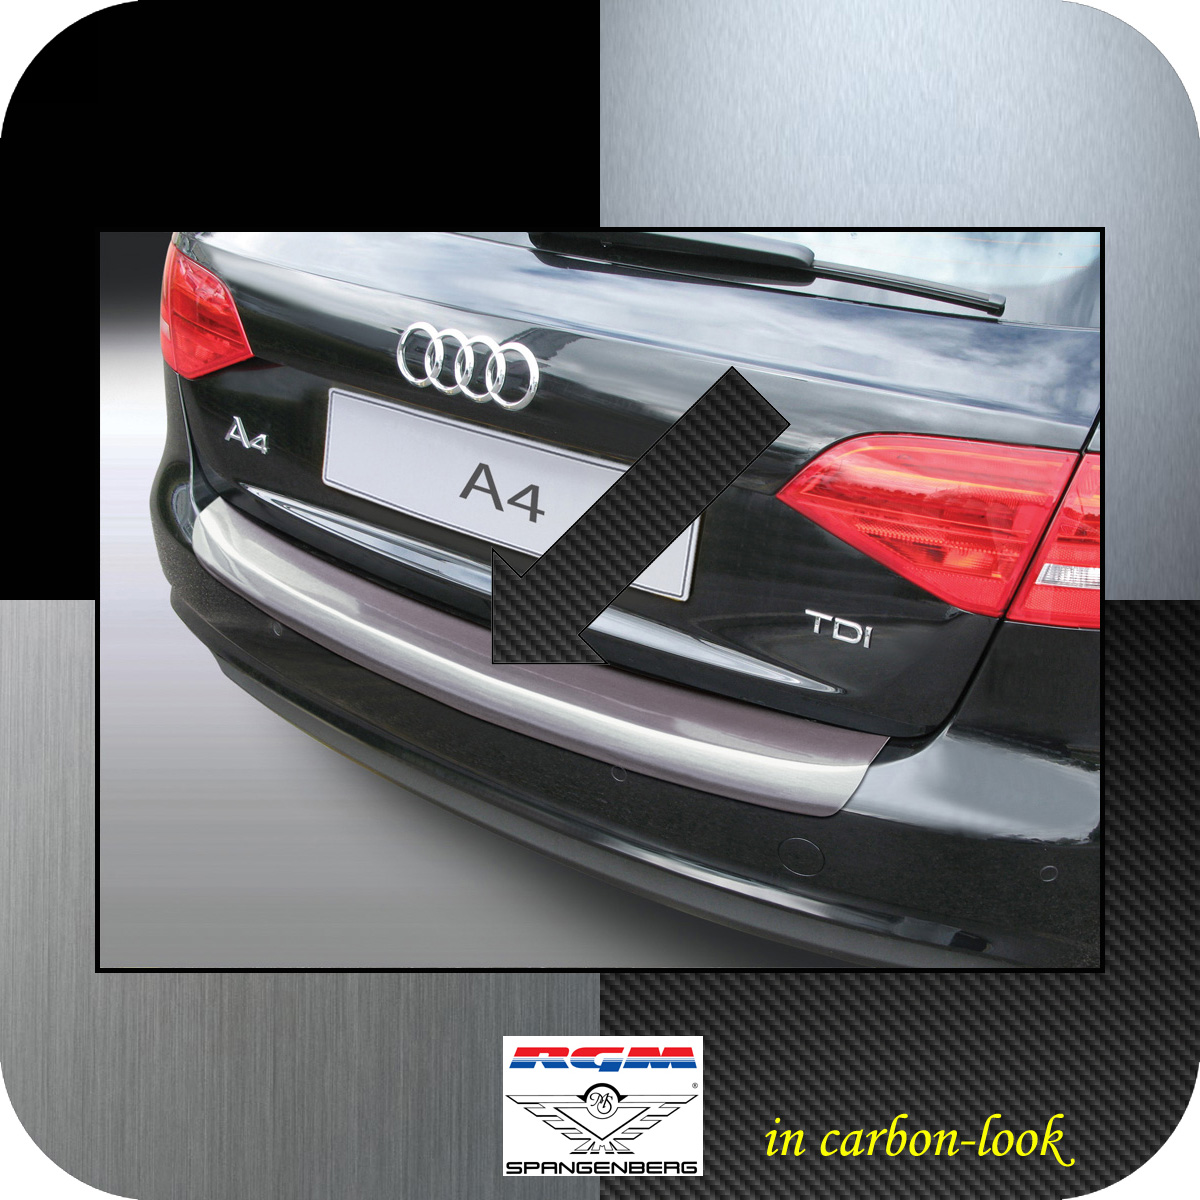 Ladekantenschutz Carbon-Look Audi A4 B8 Avant Mopf 2011-2015 auch S-Line 3509566